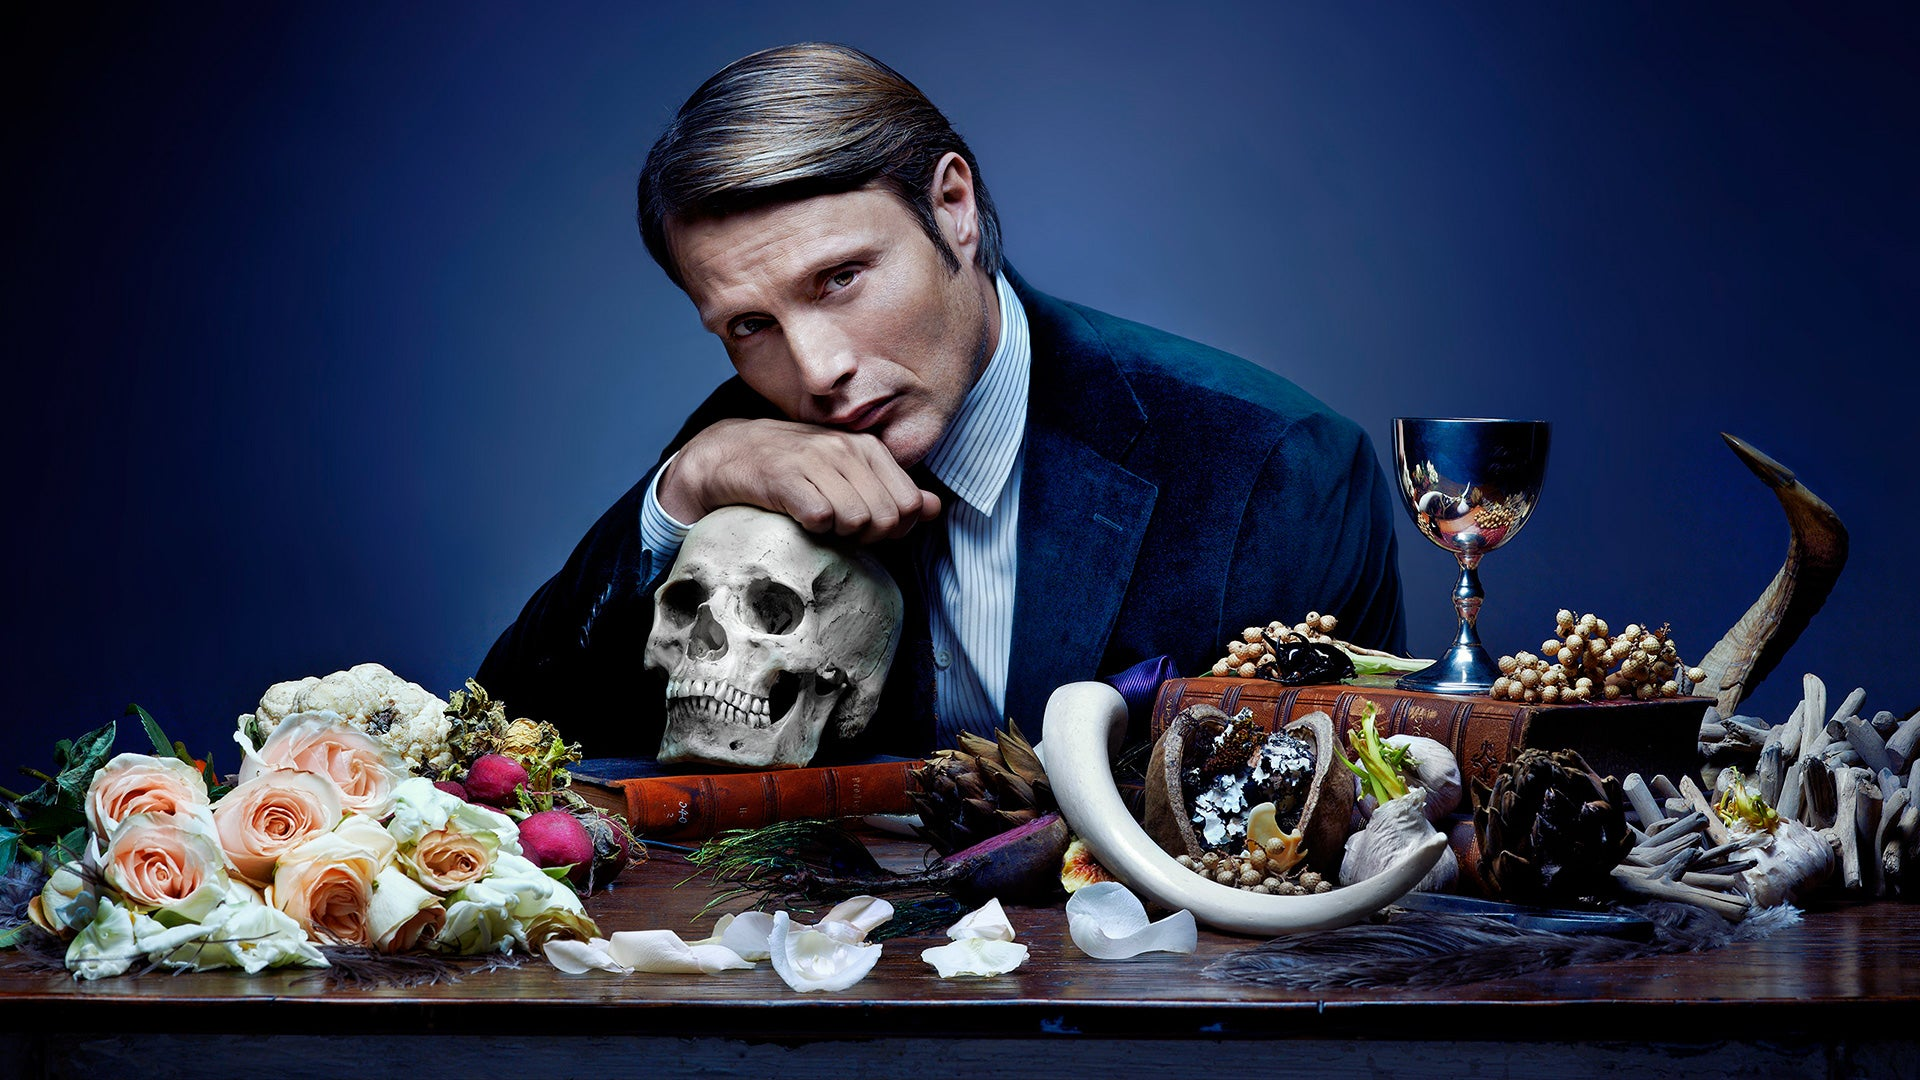 Hannibal - Mads Mikkelsen